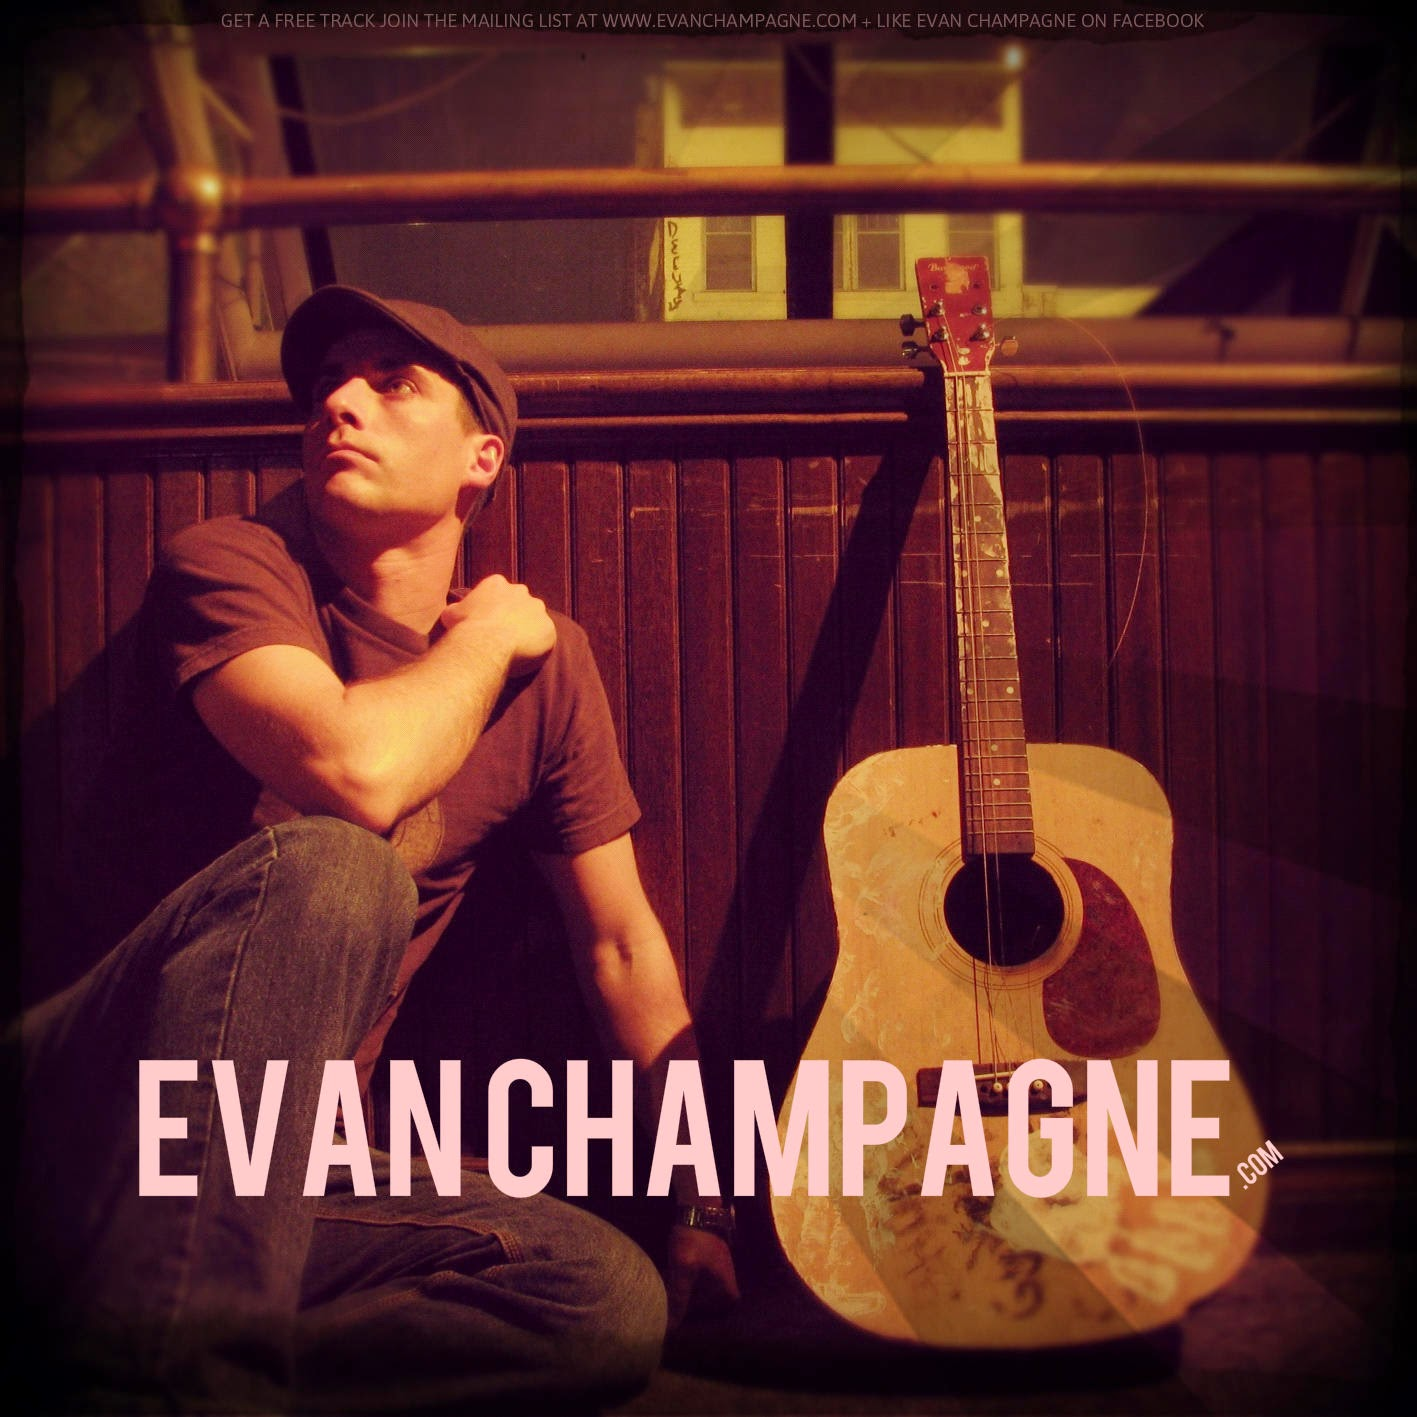 http://www.emusic.com/album/evan-champagne/evan-champagne/15184548/